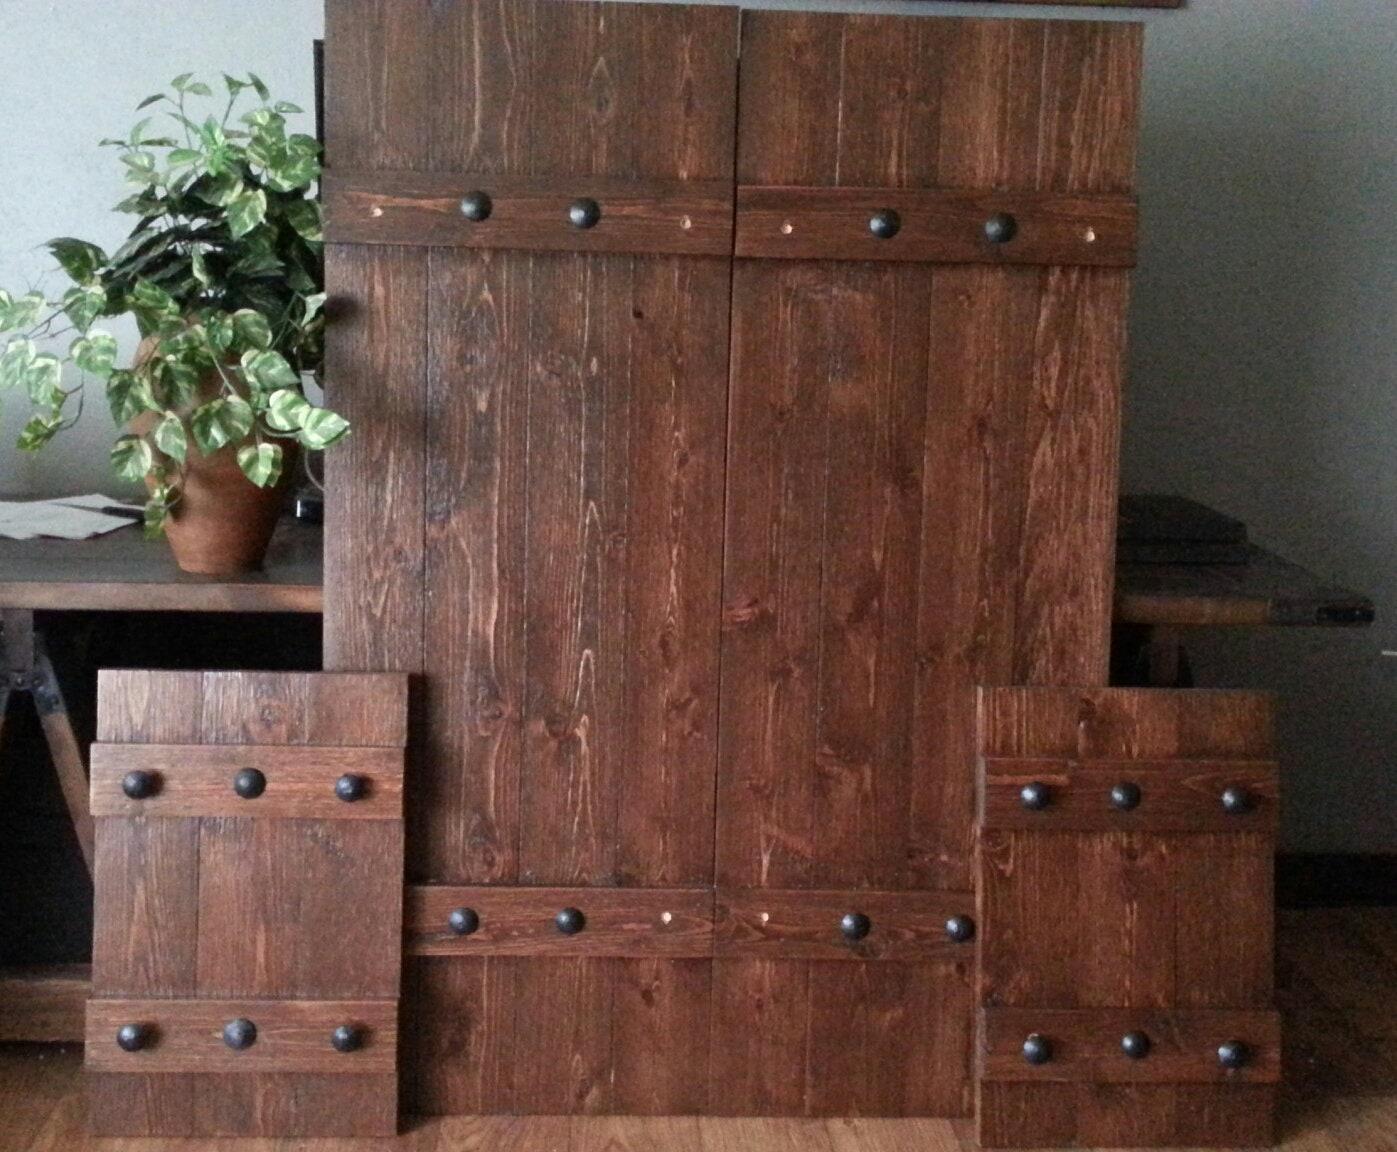 48 Rustic Wood Shutters Primitive Shutters Decorative